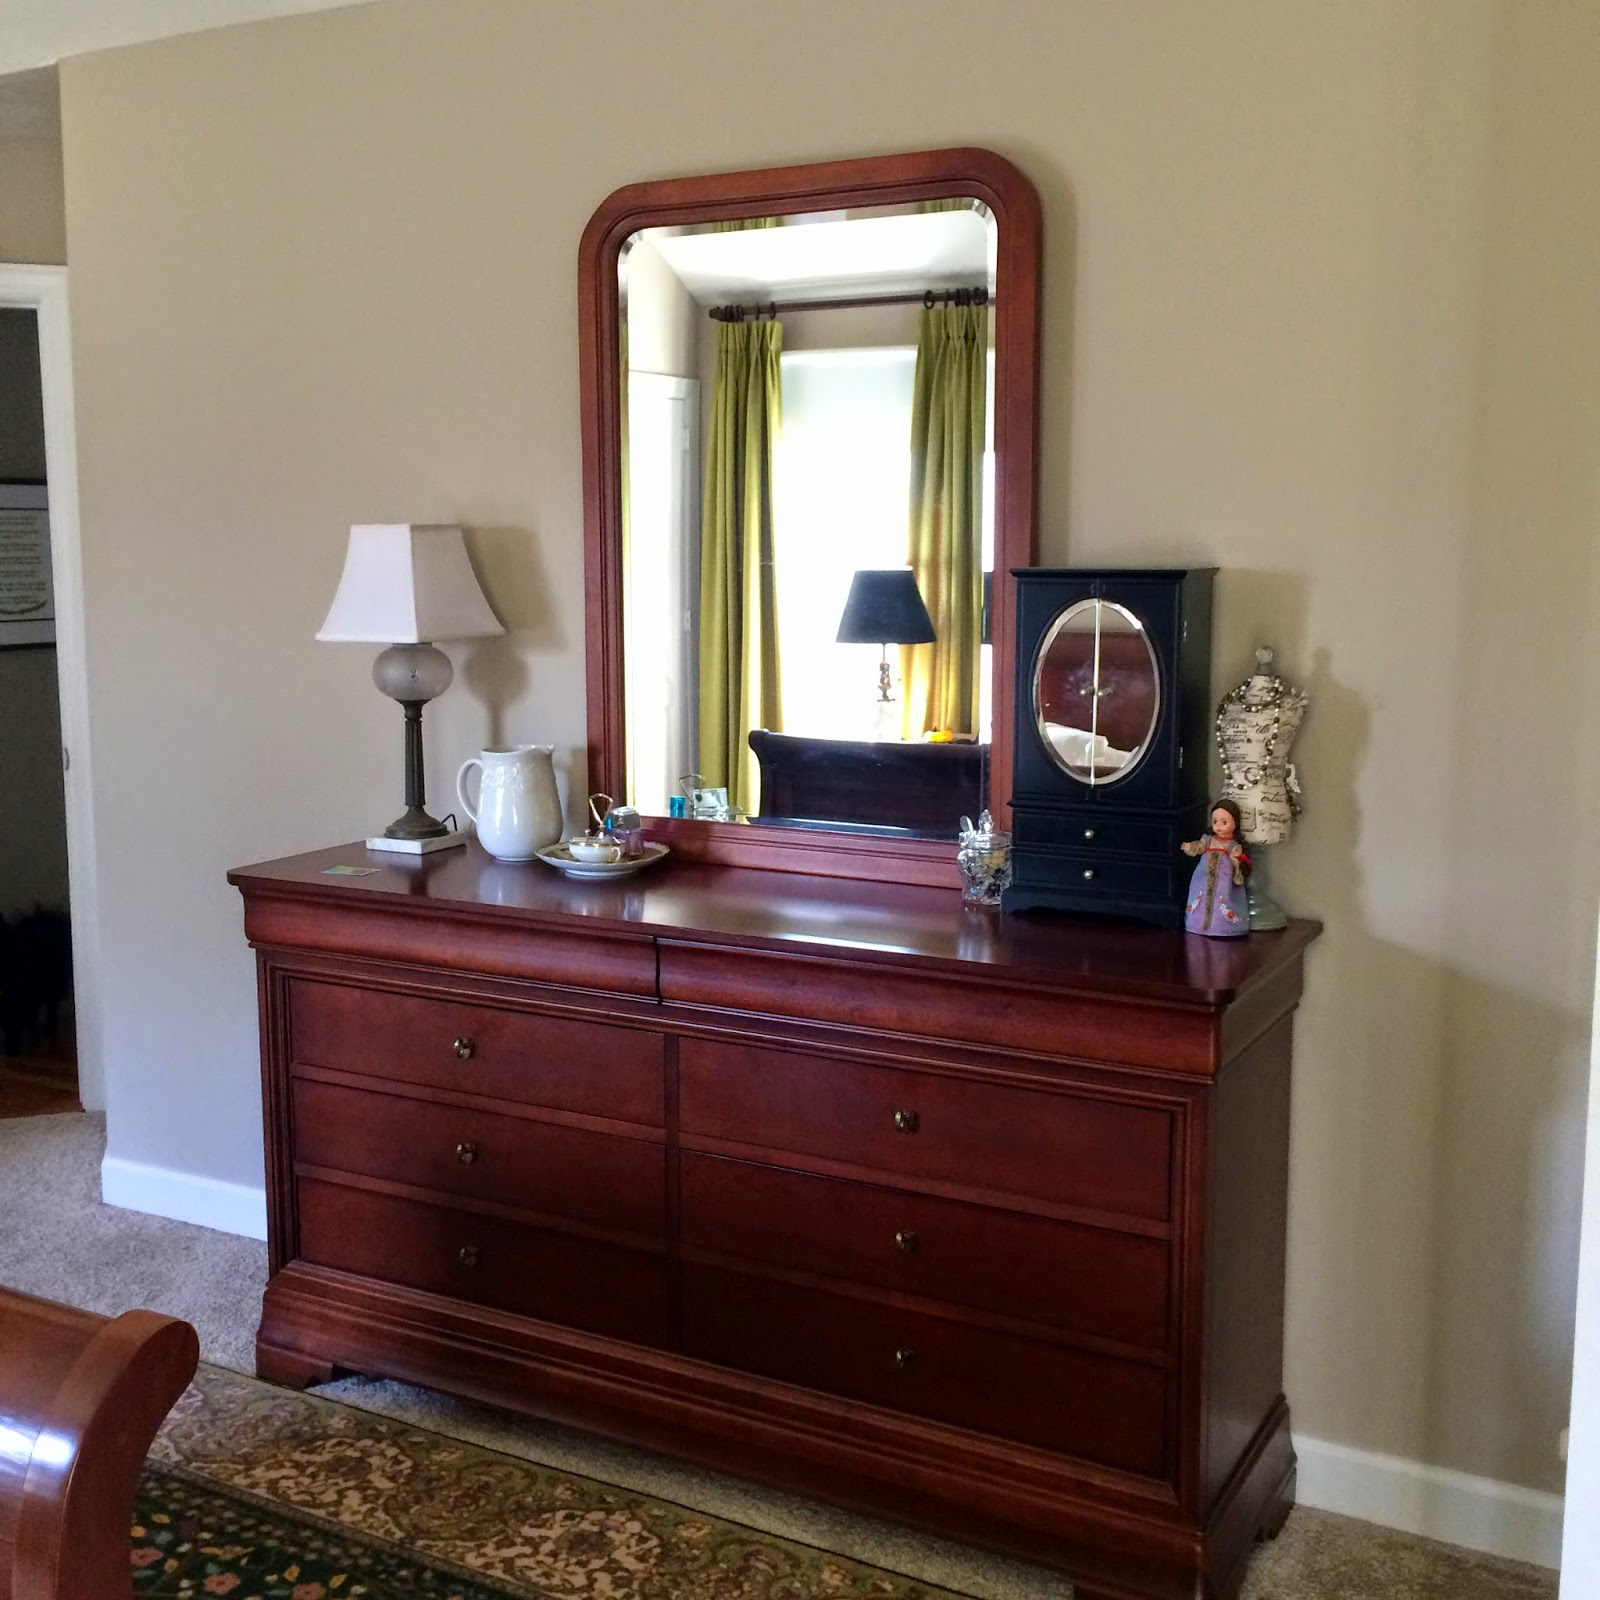 New Craigslist Raleigh Furniture | eatatsams.com